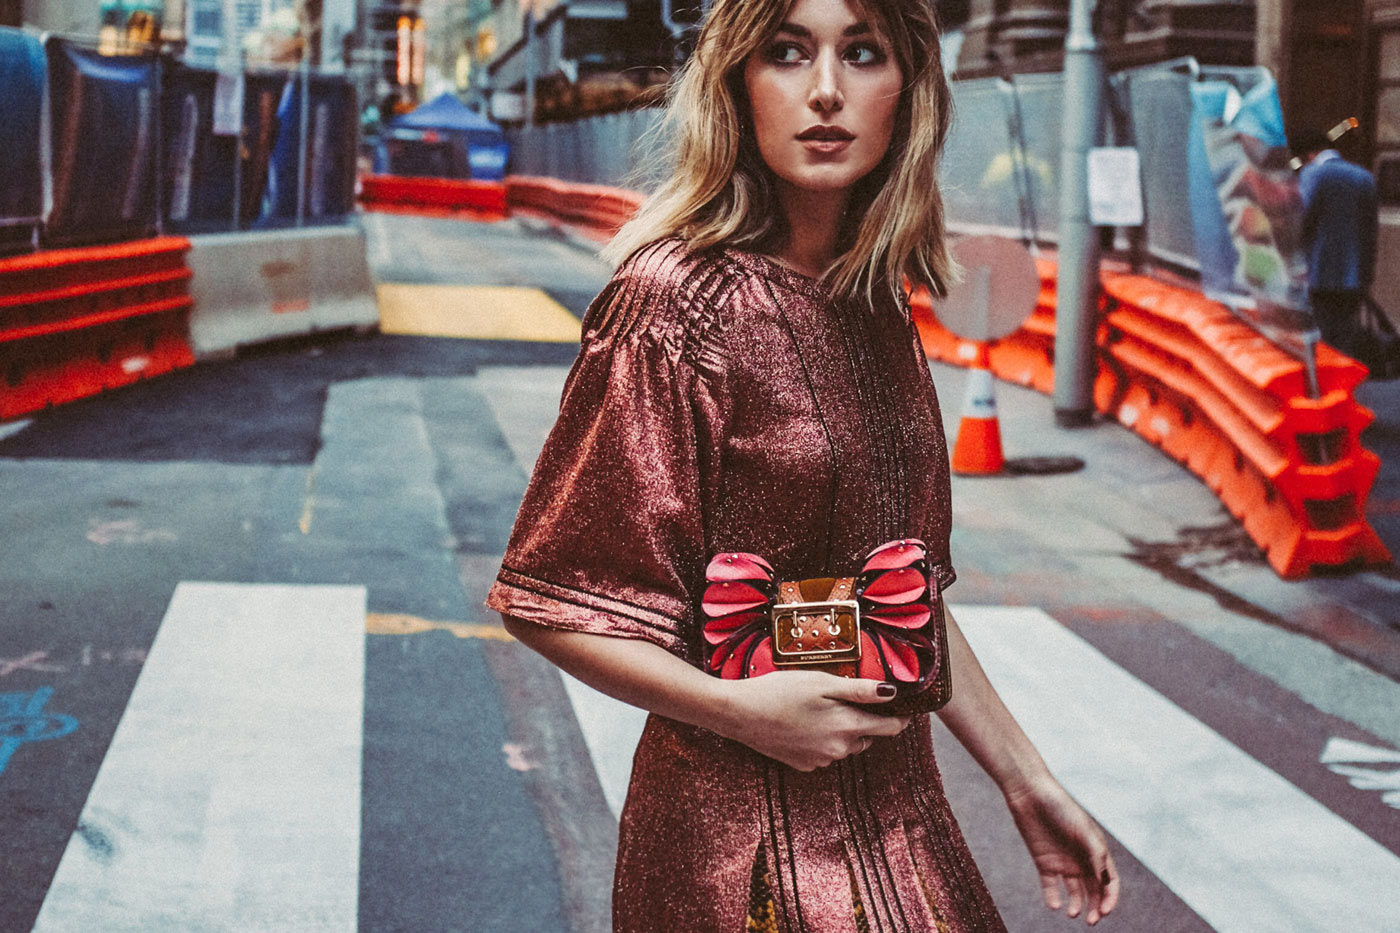 metallic-dress-burberry-street-style-1400x9331